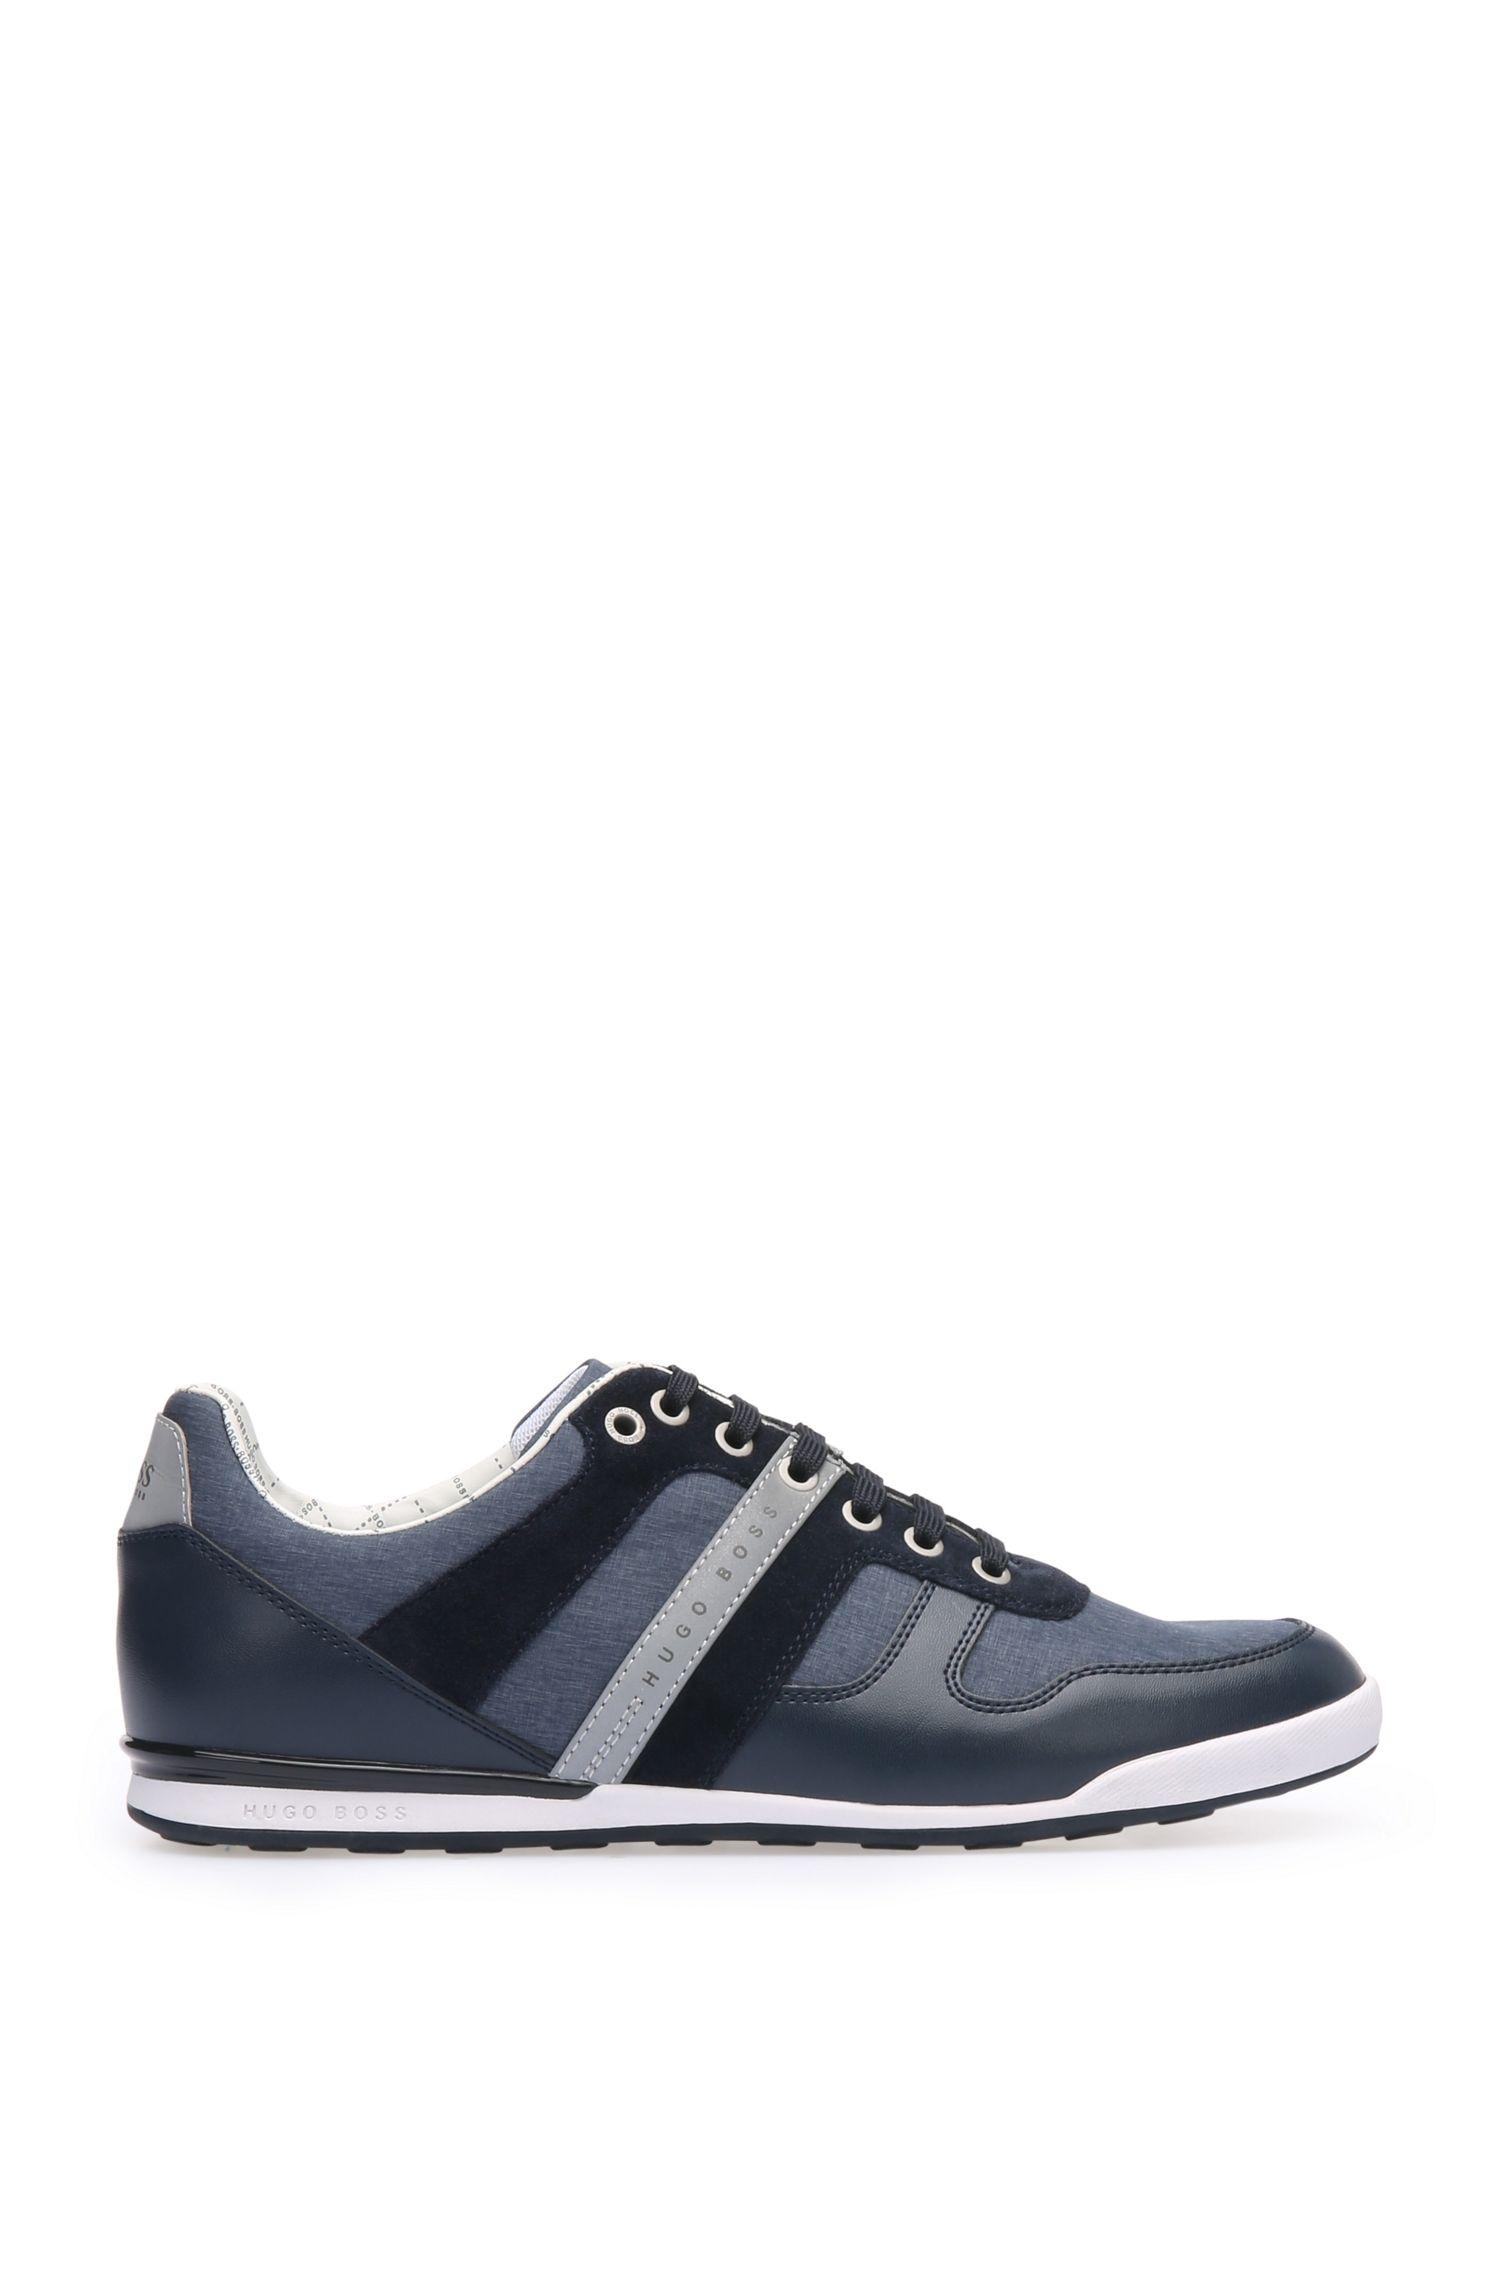 Sneakers aus Material-Mix mit Gewebe und Leder: ´Arkansas_Lowp_nych`